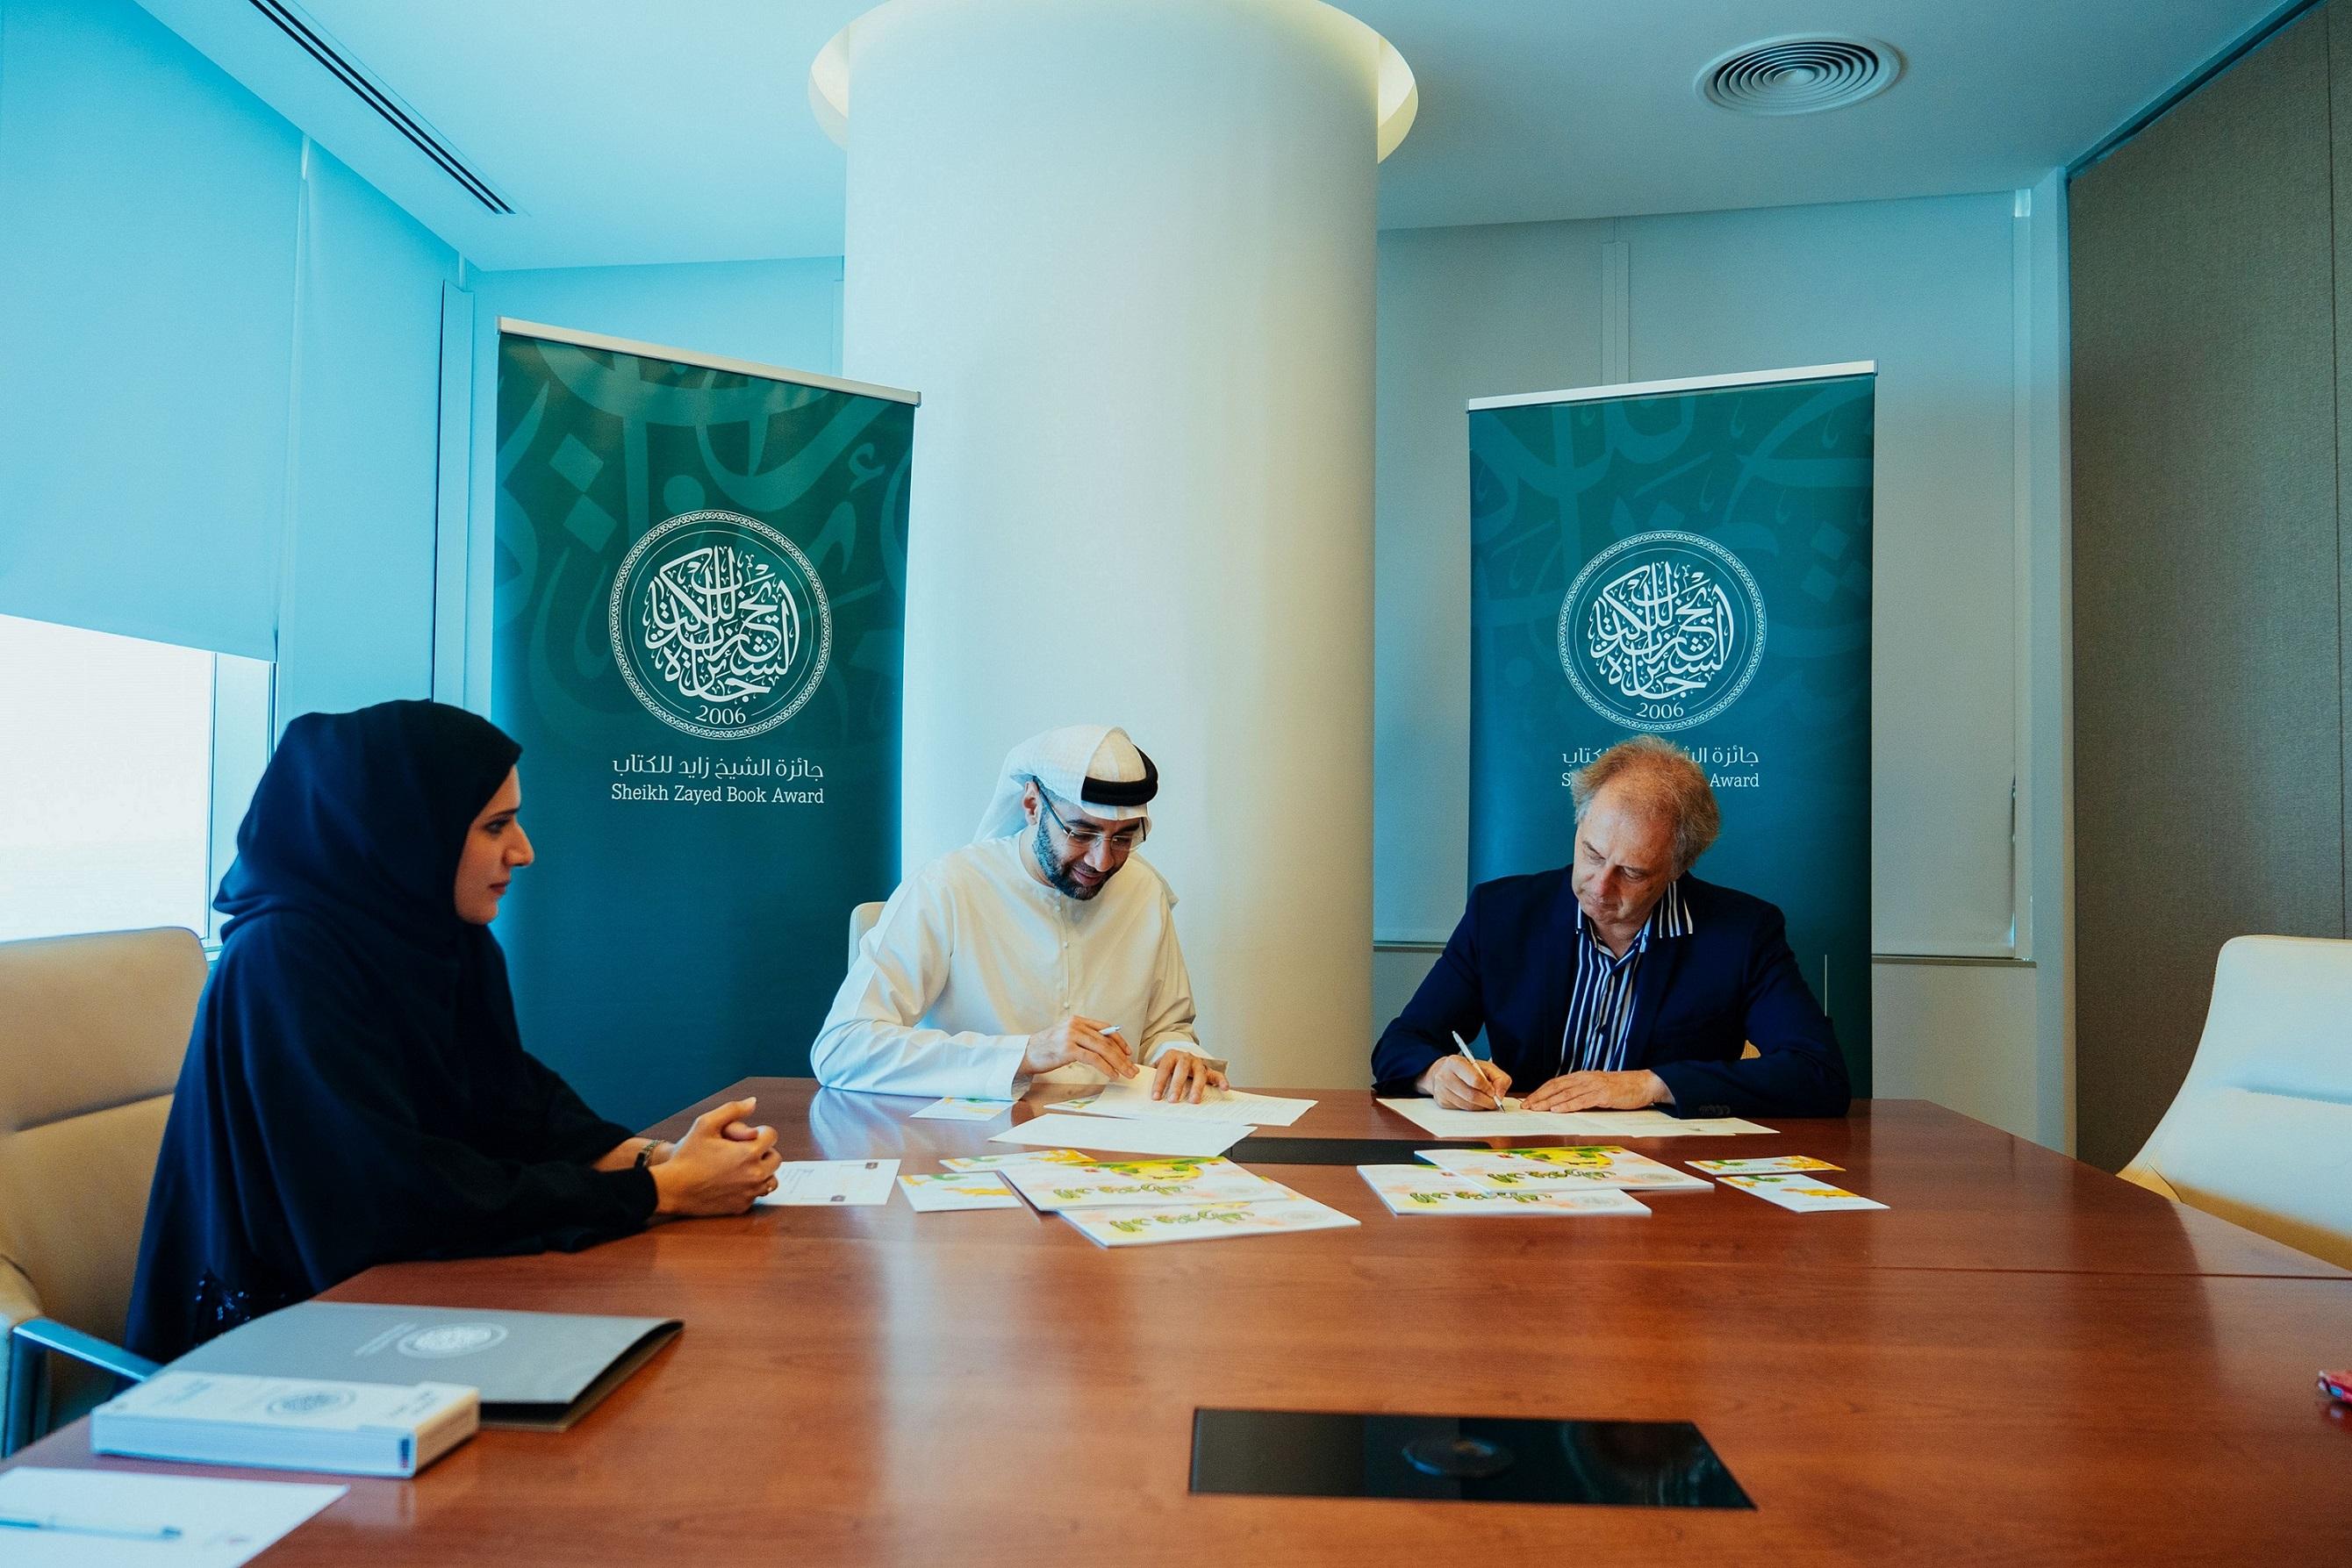 sheikh zayed book award to translate 'the dinoraf' into three languages 2